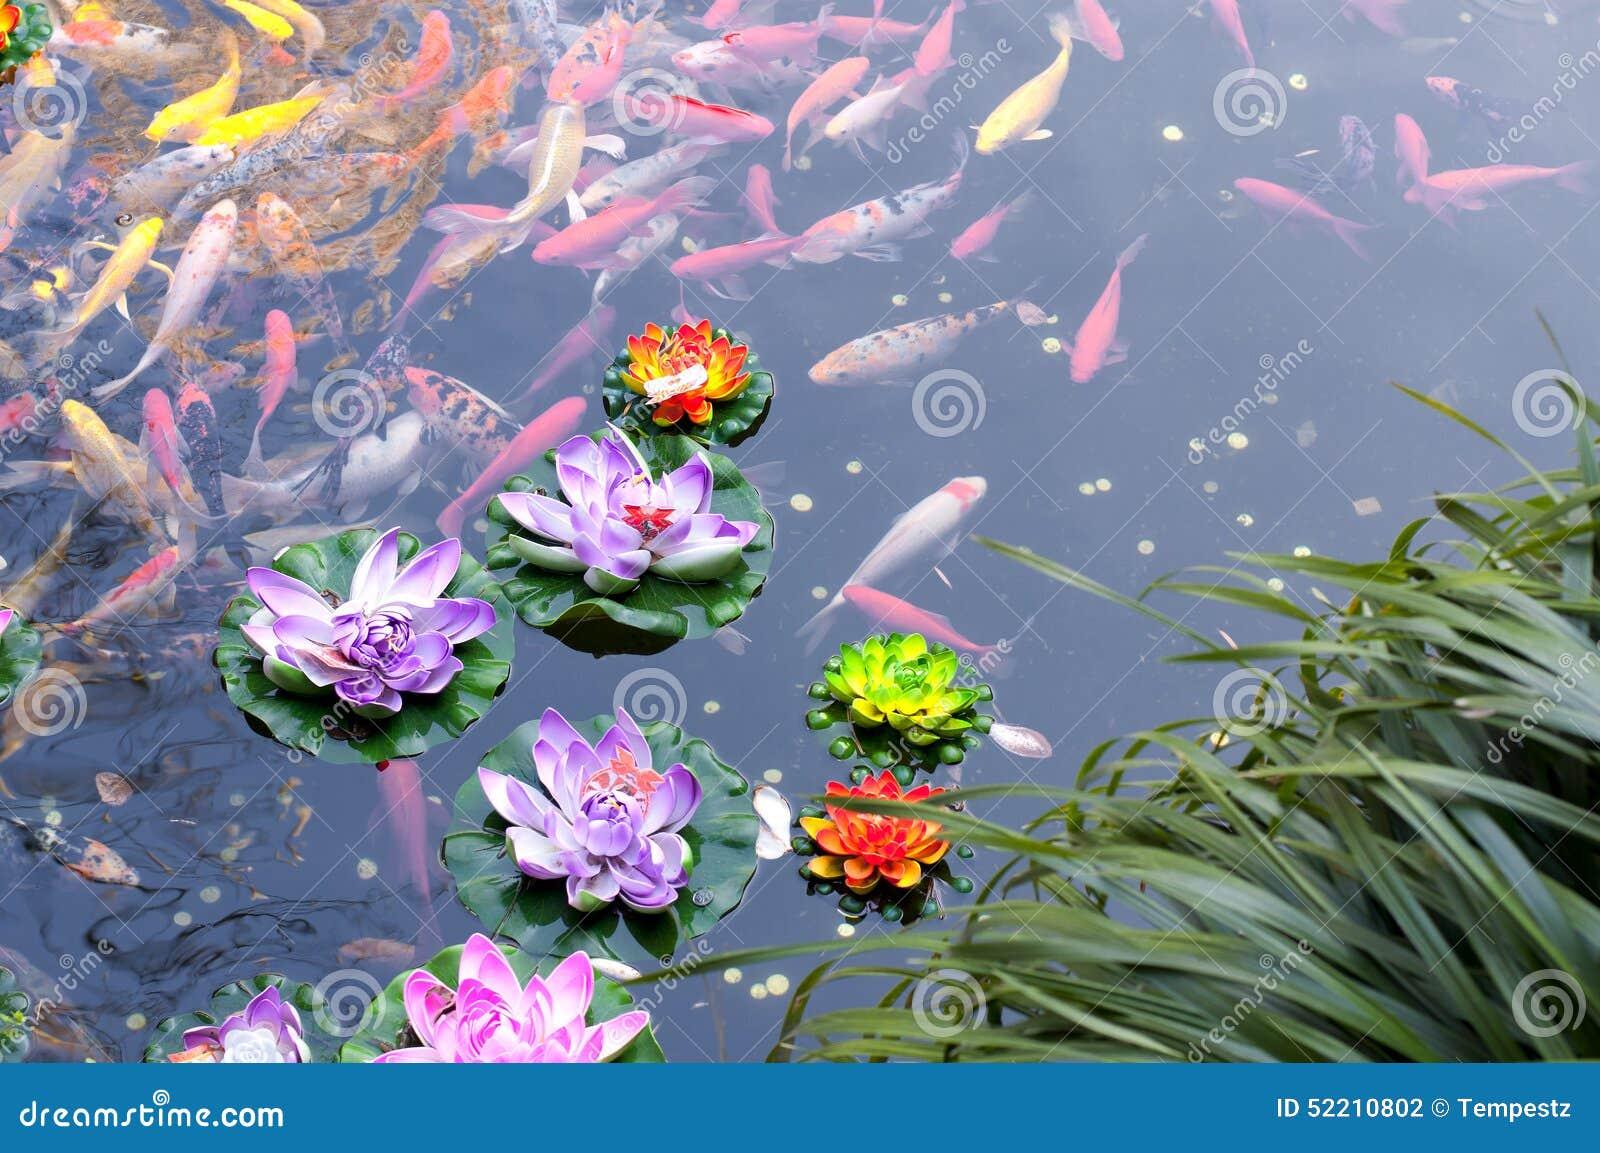 Koi pond stock photo image 52210802 for Koi fish pond lotus